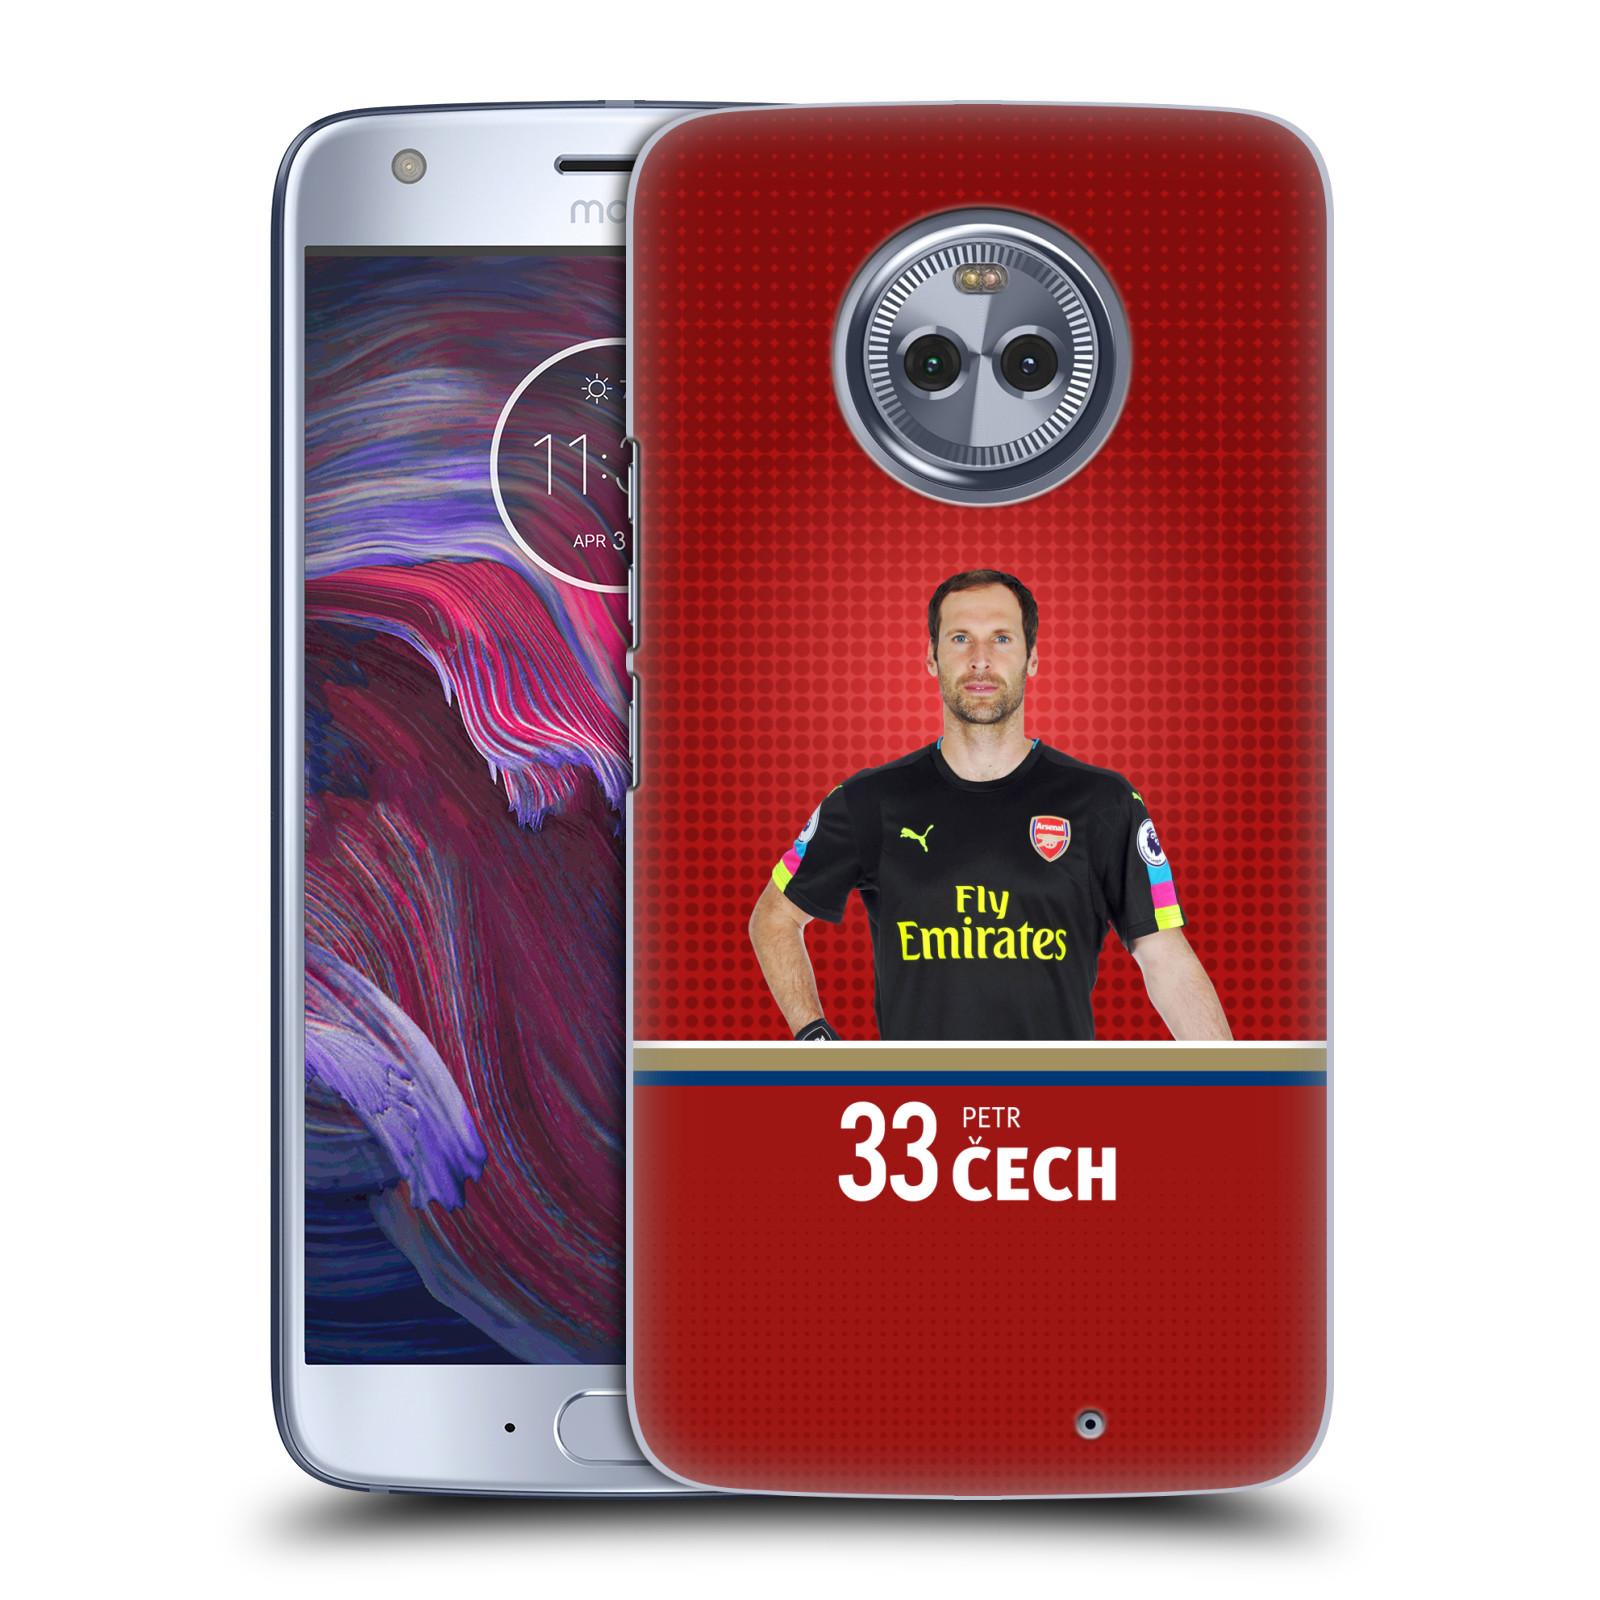 Plastové pouzdro na mobil Lenovo Moto X4 - Head Case - Arsenal FC - Petr Čech